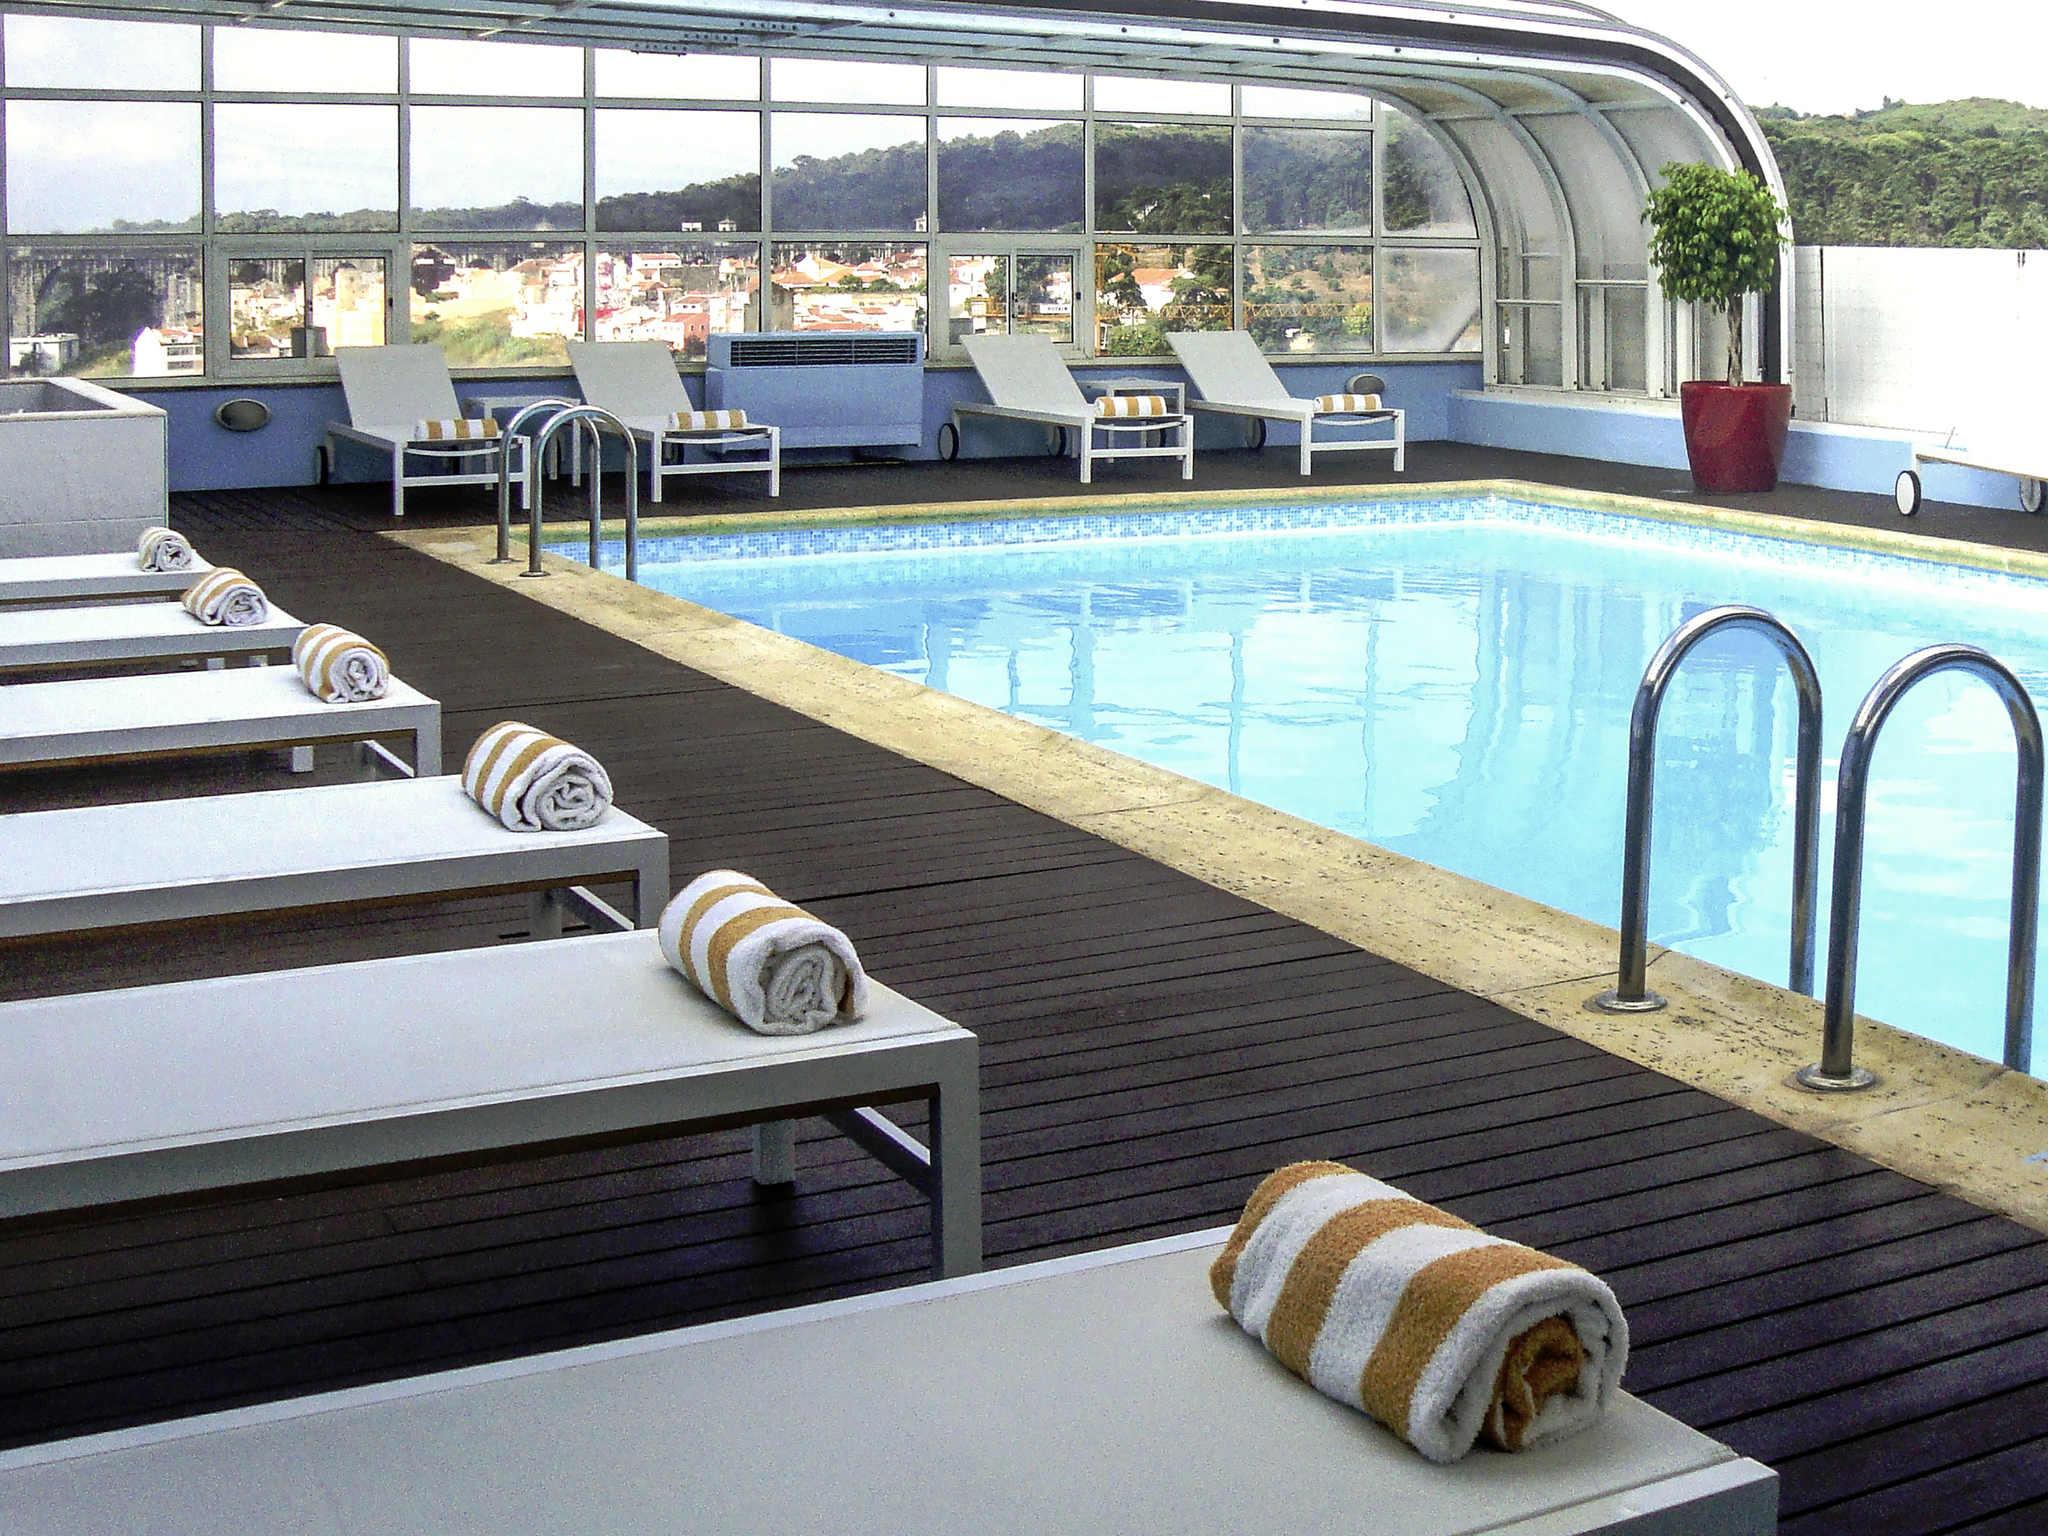 Mercure Lisboa Hotel: Comfort and Modernity - AccorHotels